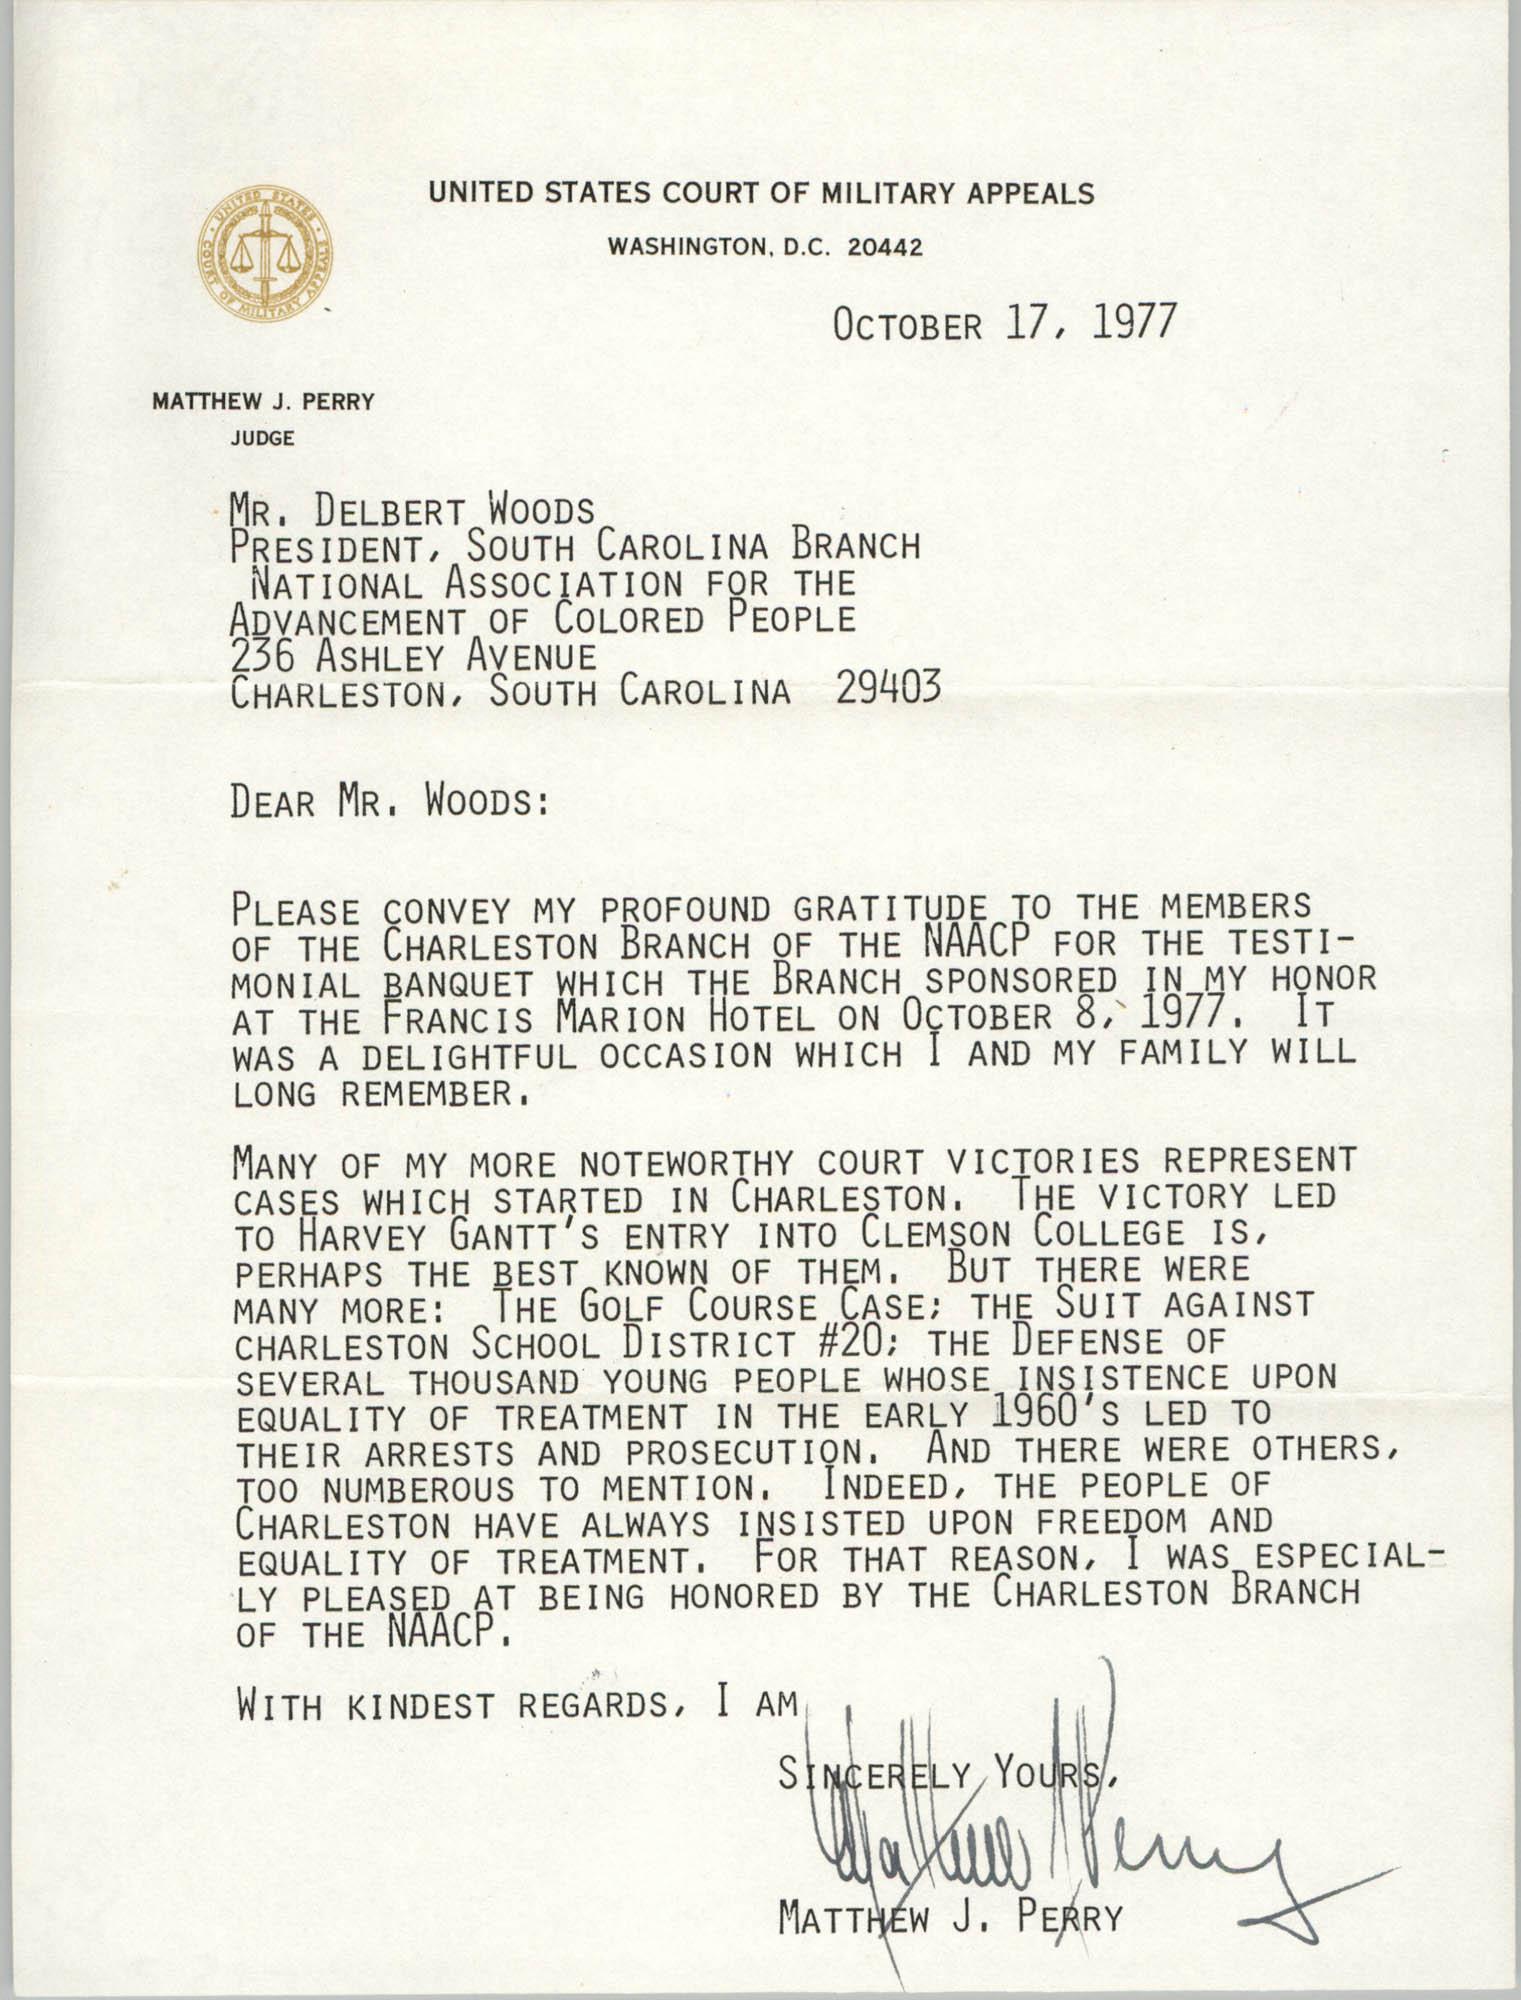 Letter from Matthew J. Perry to Delbert Woods, October 17, 1977